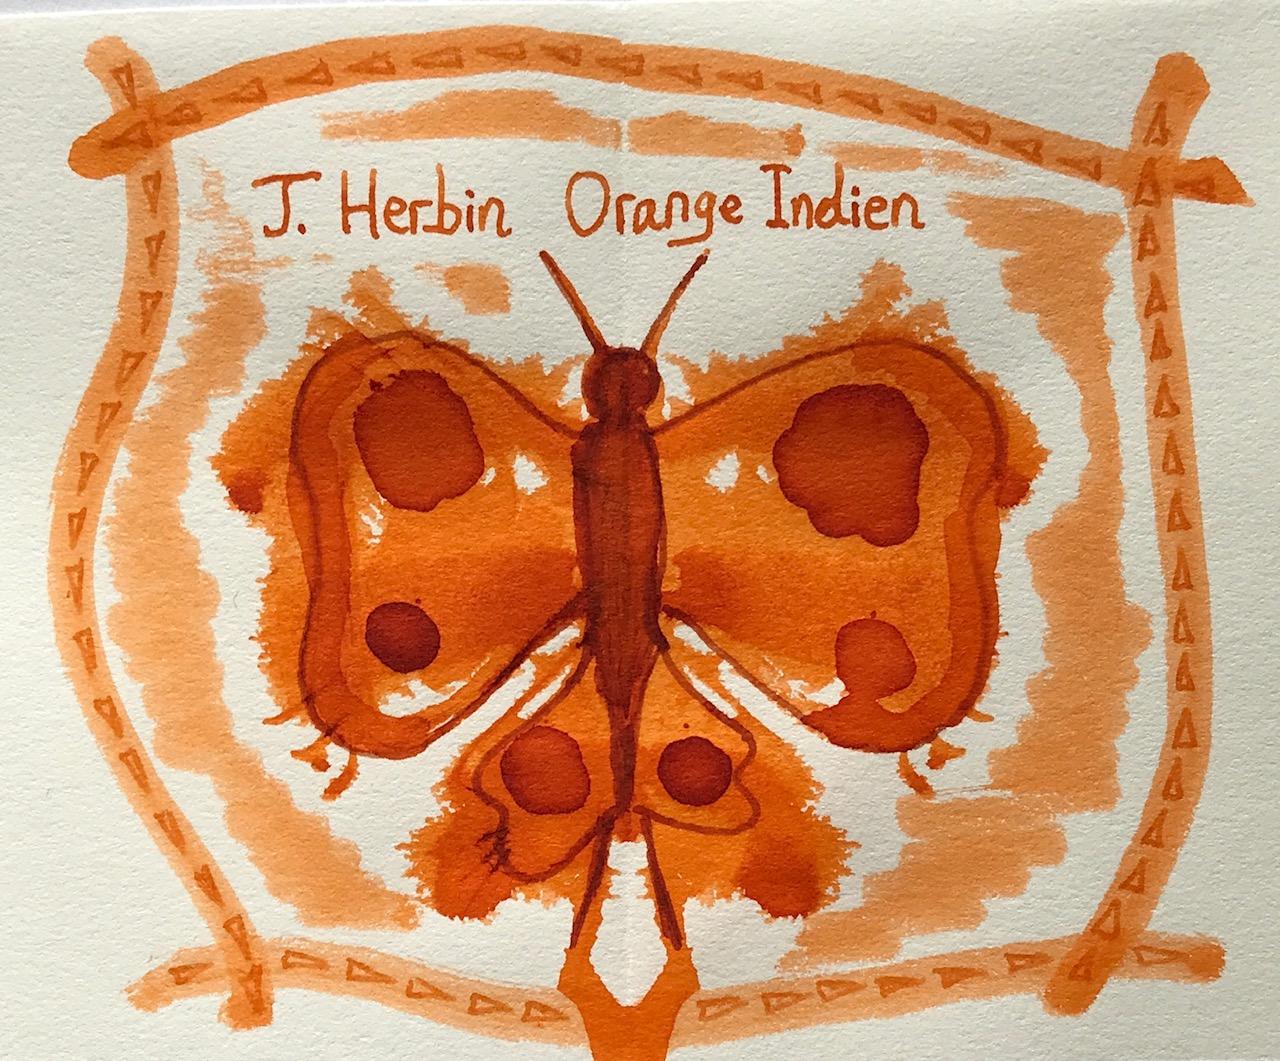 fpn_1565879609__j_herbin_-_orange_indien